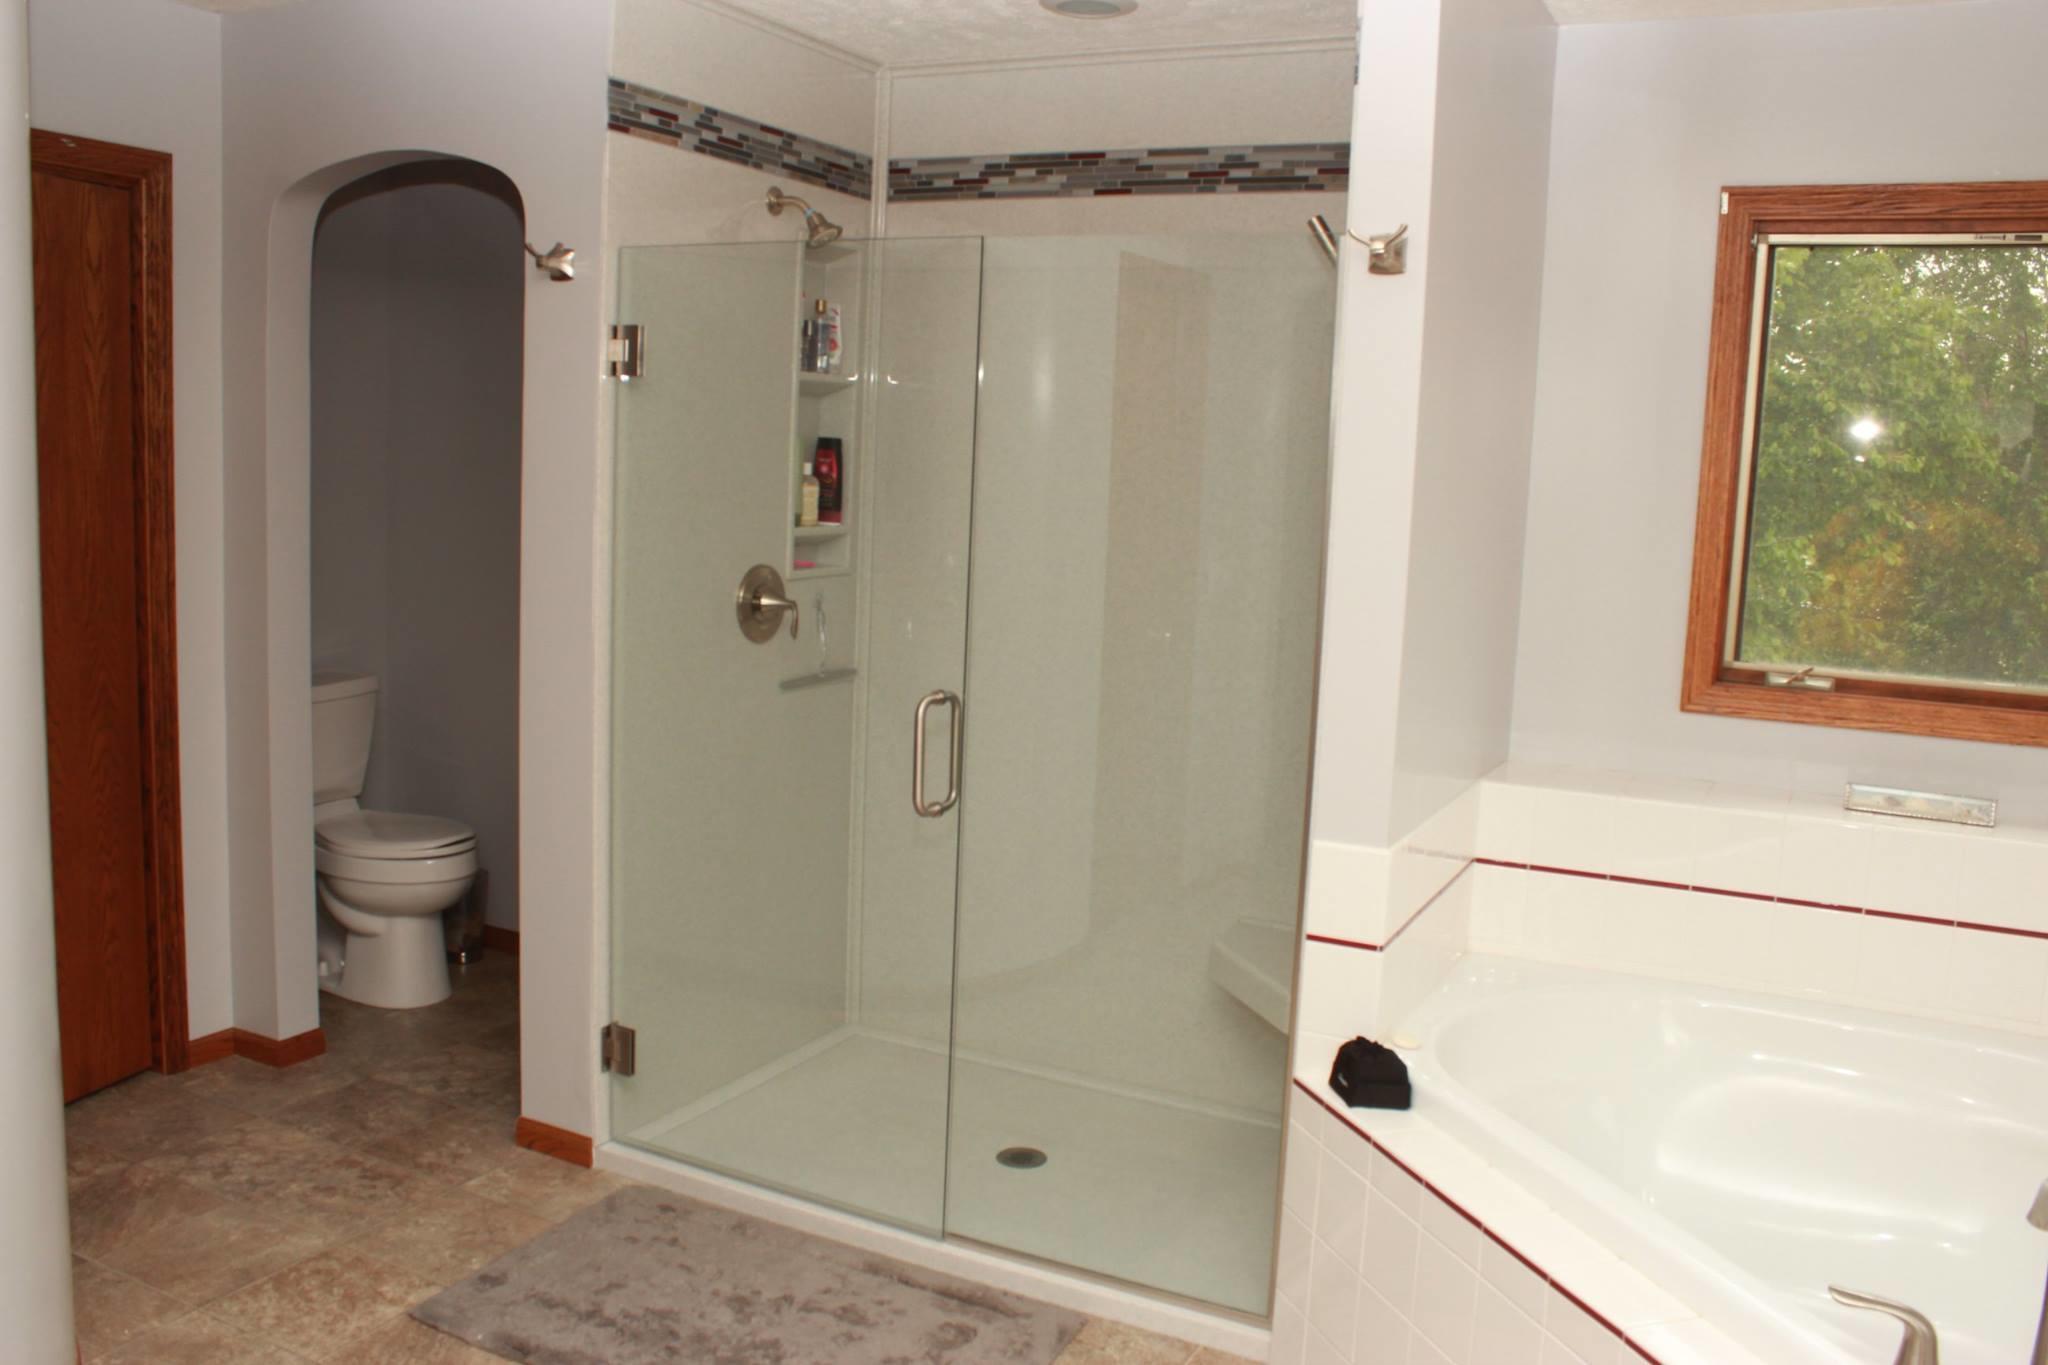 Bathroom Remodeling Lincoln Ne : Bathroom remodel lincoln ne build backyard shed white